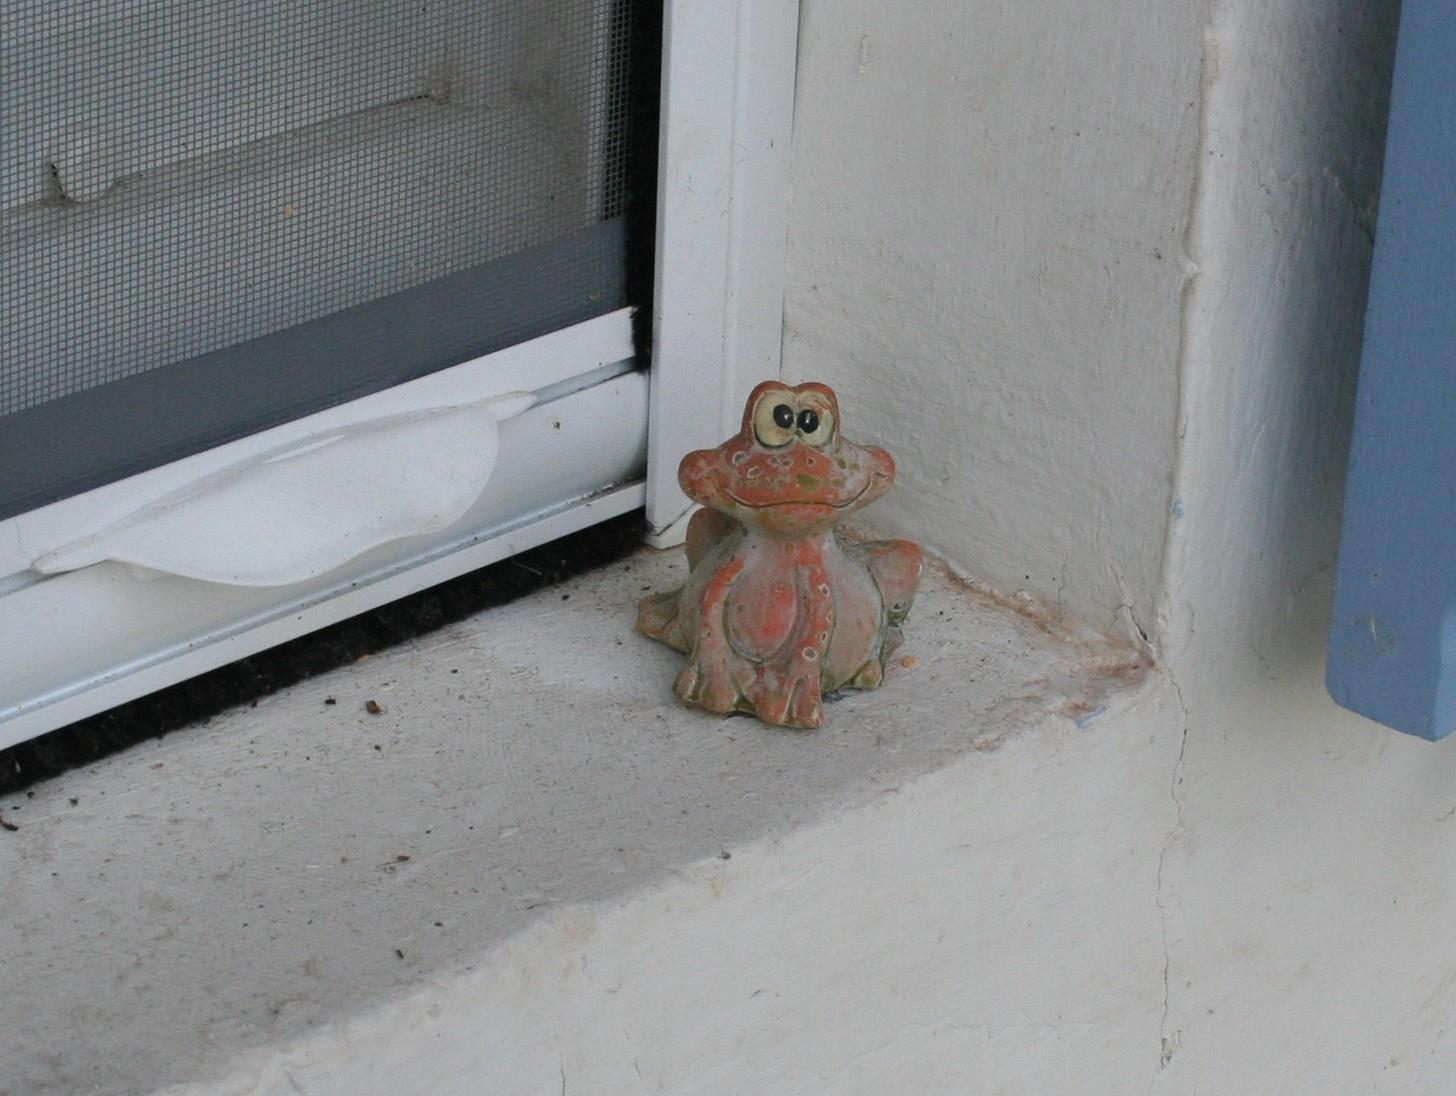 grenouille.jpg.e34248b91dff707f7ba749445836f24f.jpg